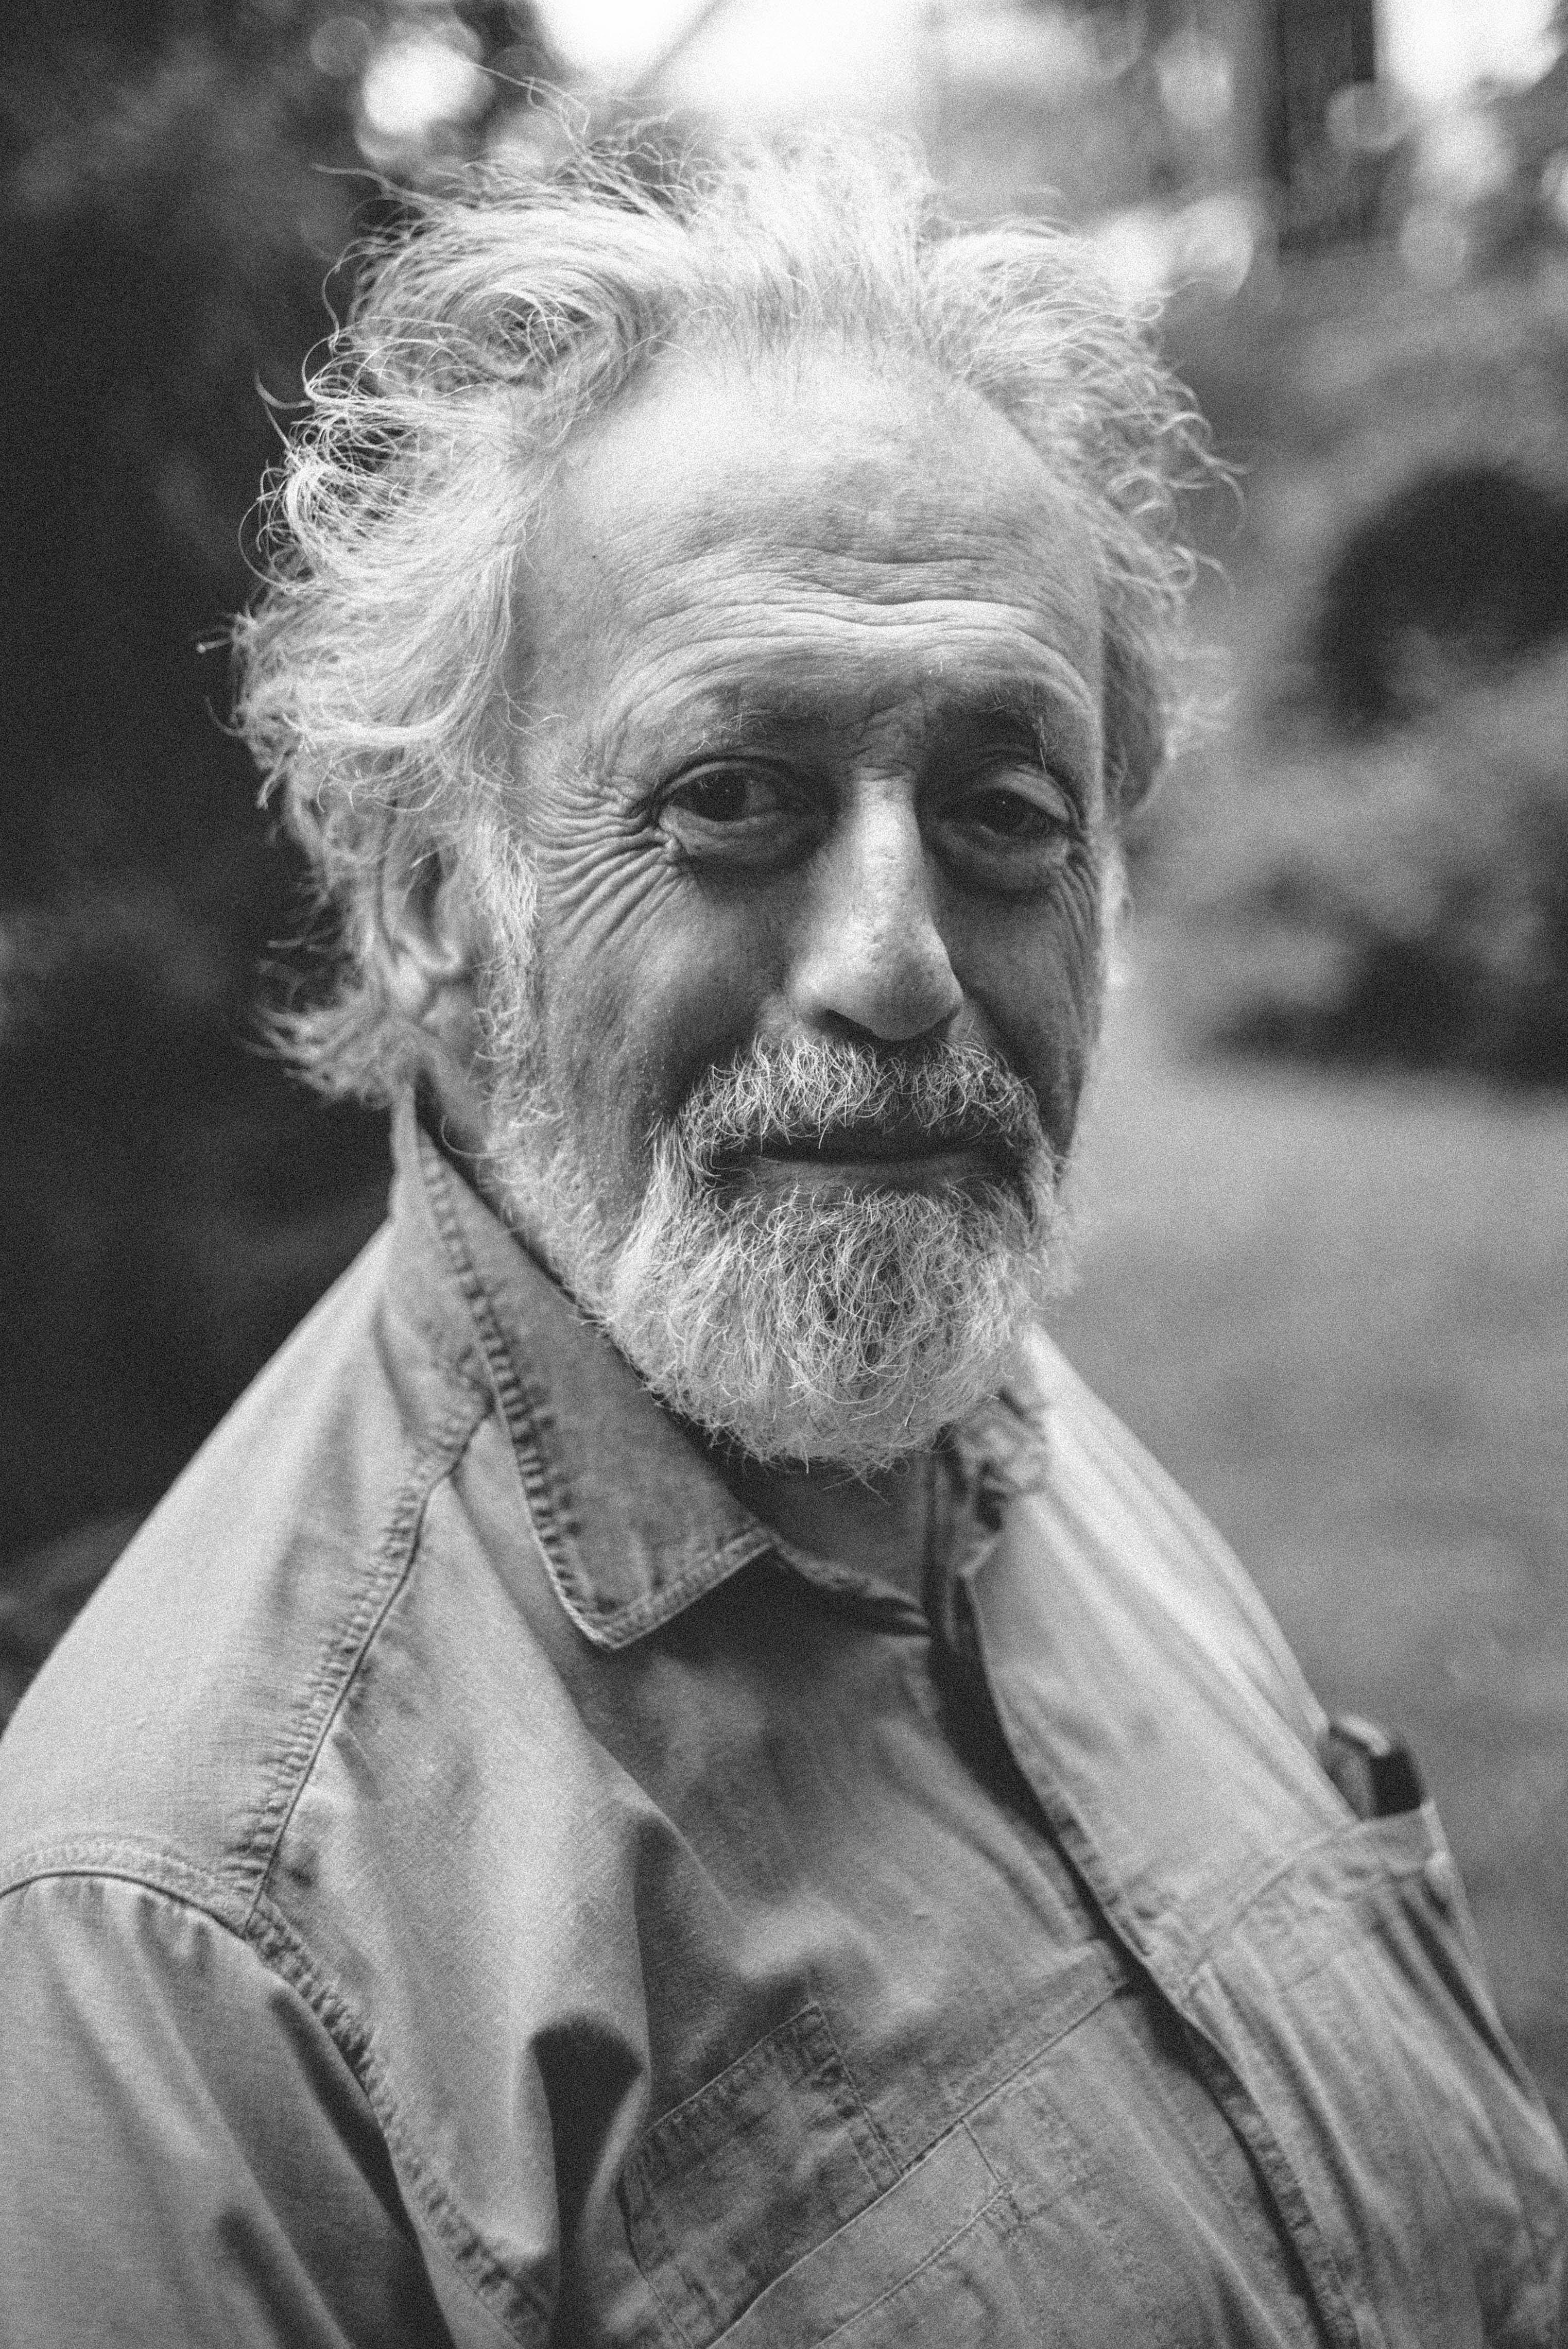 grayscale photograph of man's portrait